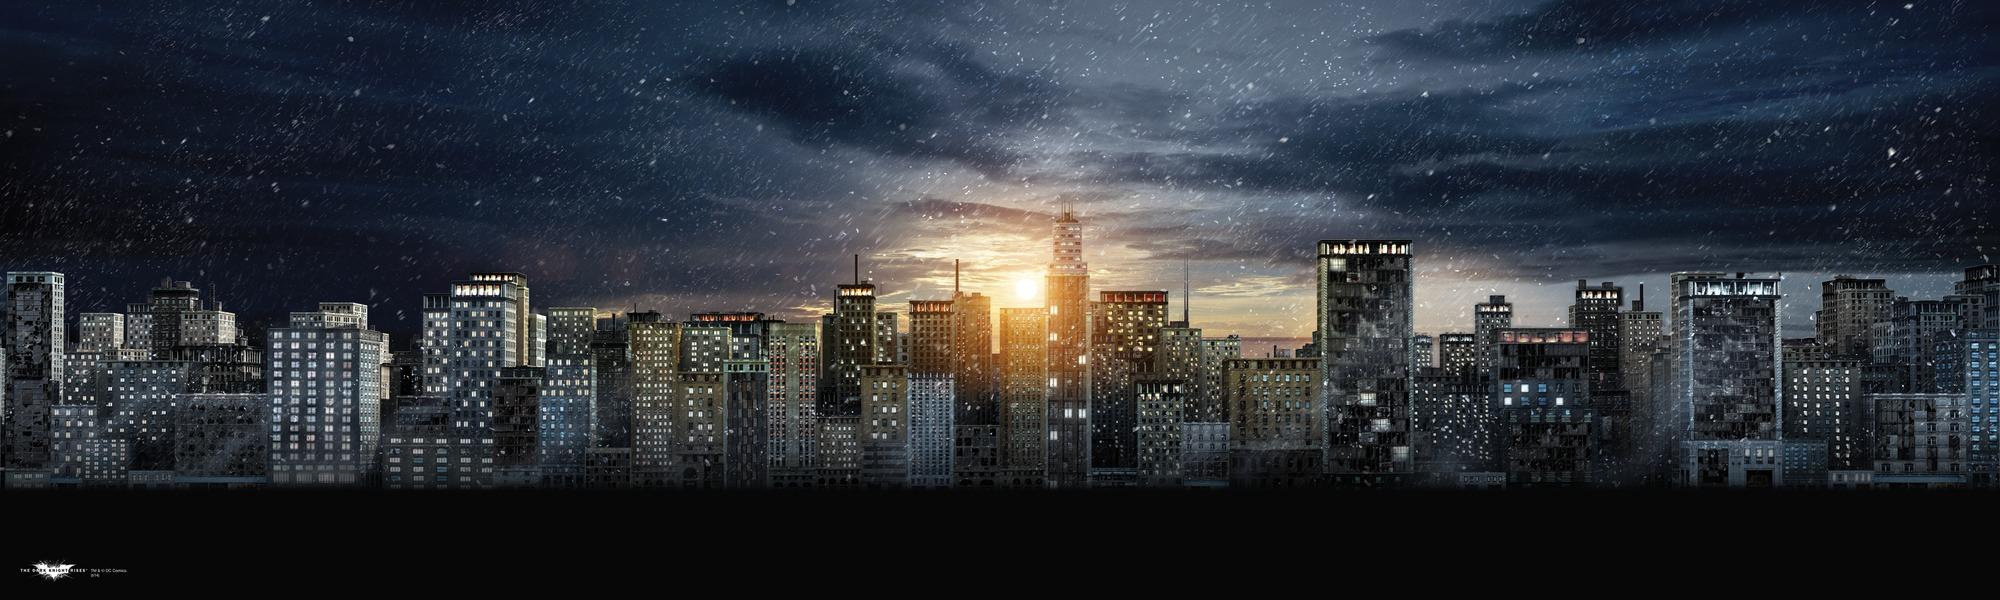 Gotham City Wallpaper Sf Wallpaper